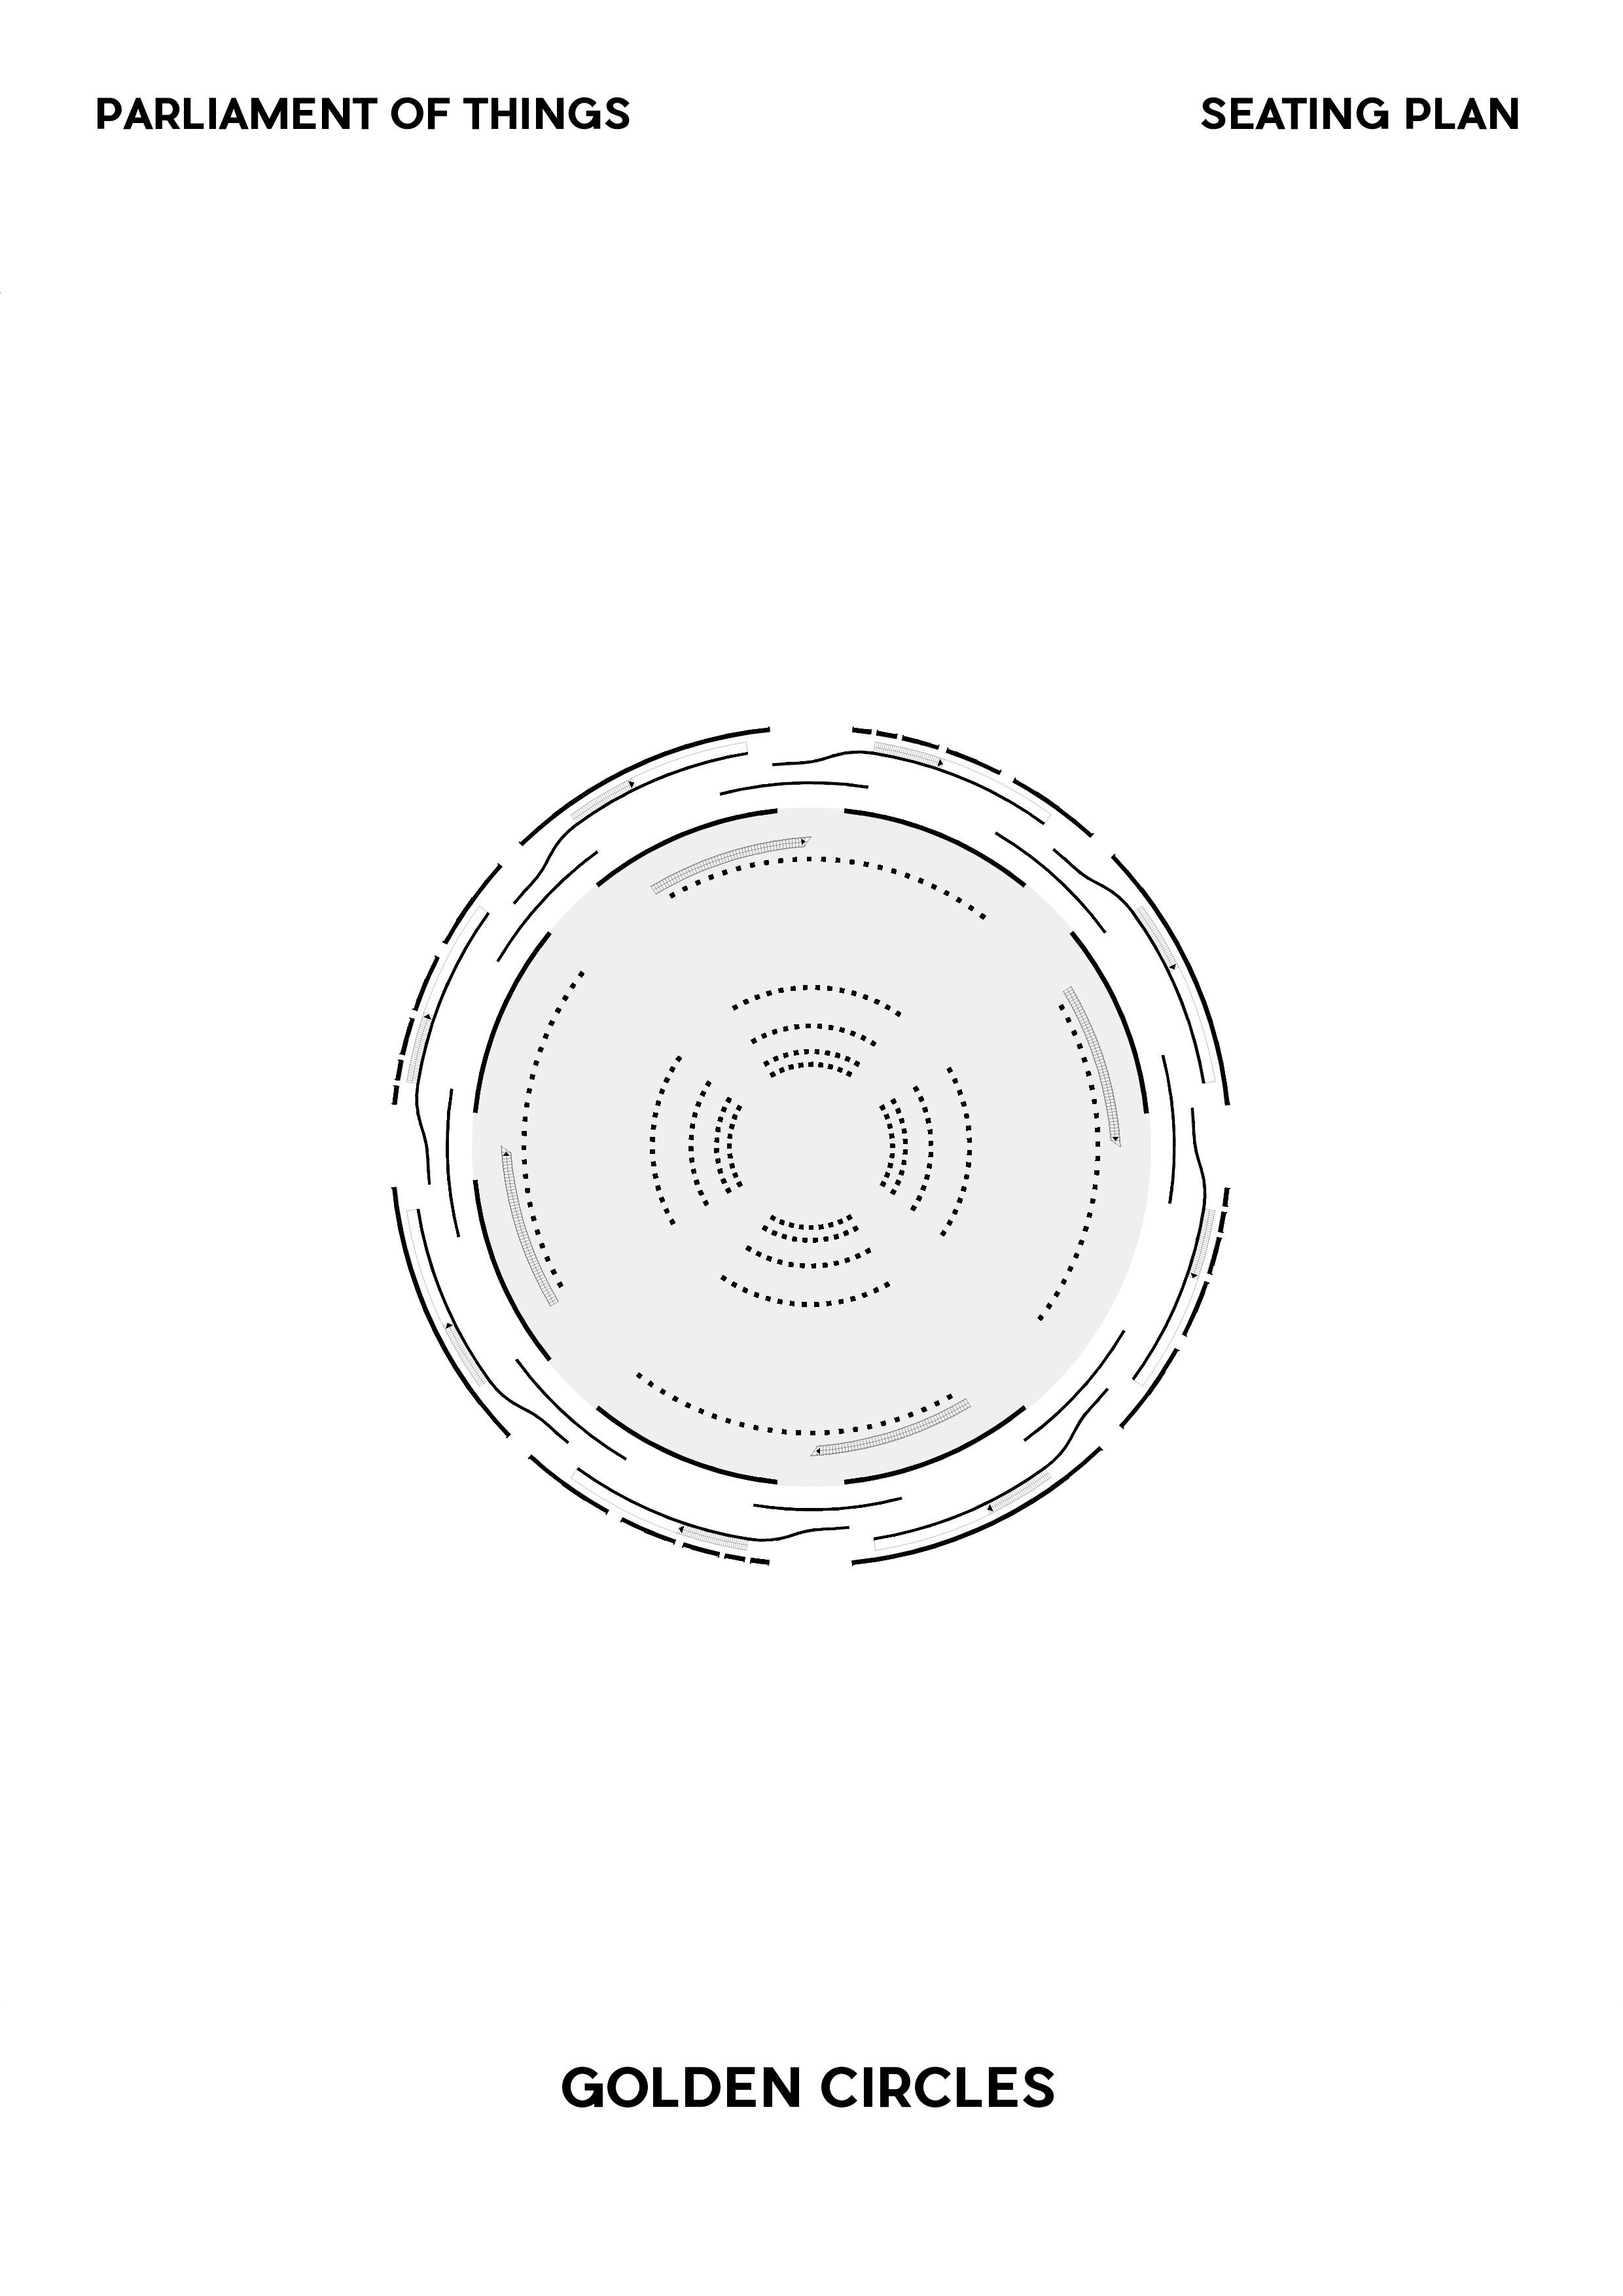 POT_seatingarrangements_2.jpg